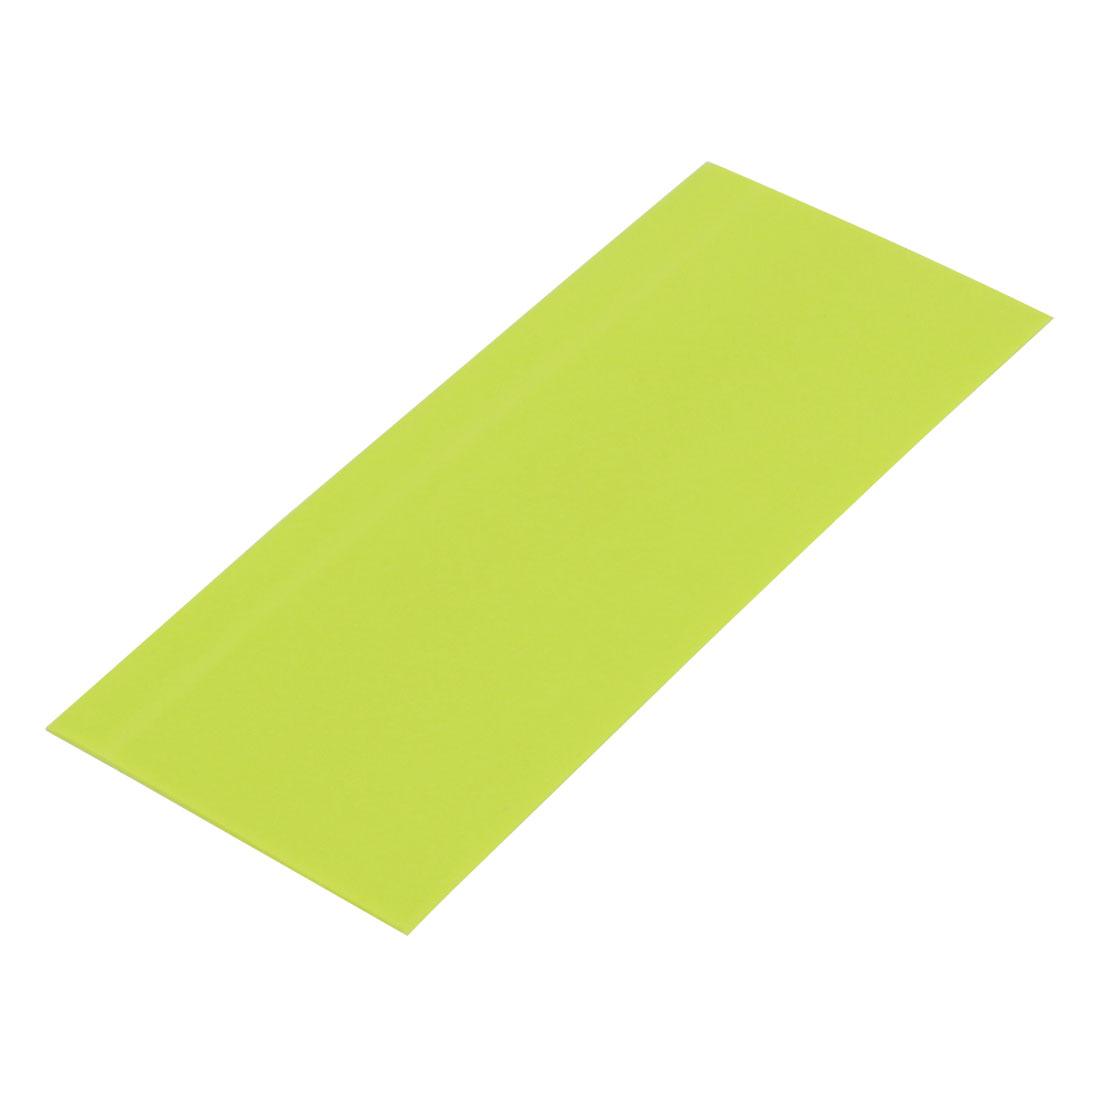 23mm Flat Width 53mm Length PVC Heat Shrinkable Tube Olive Green for AA Battery